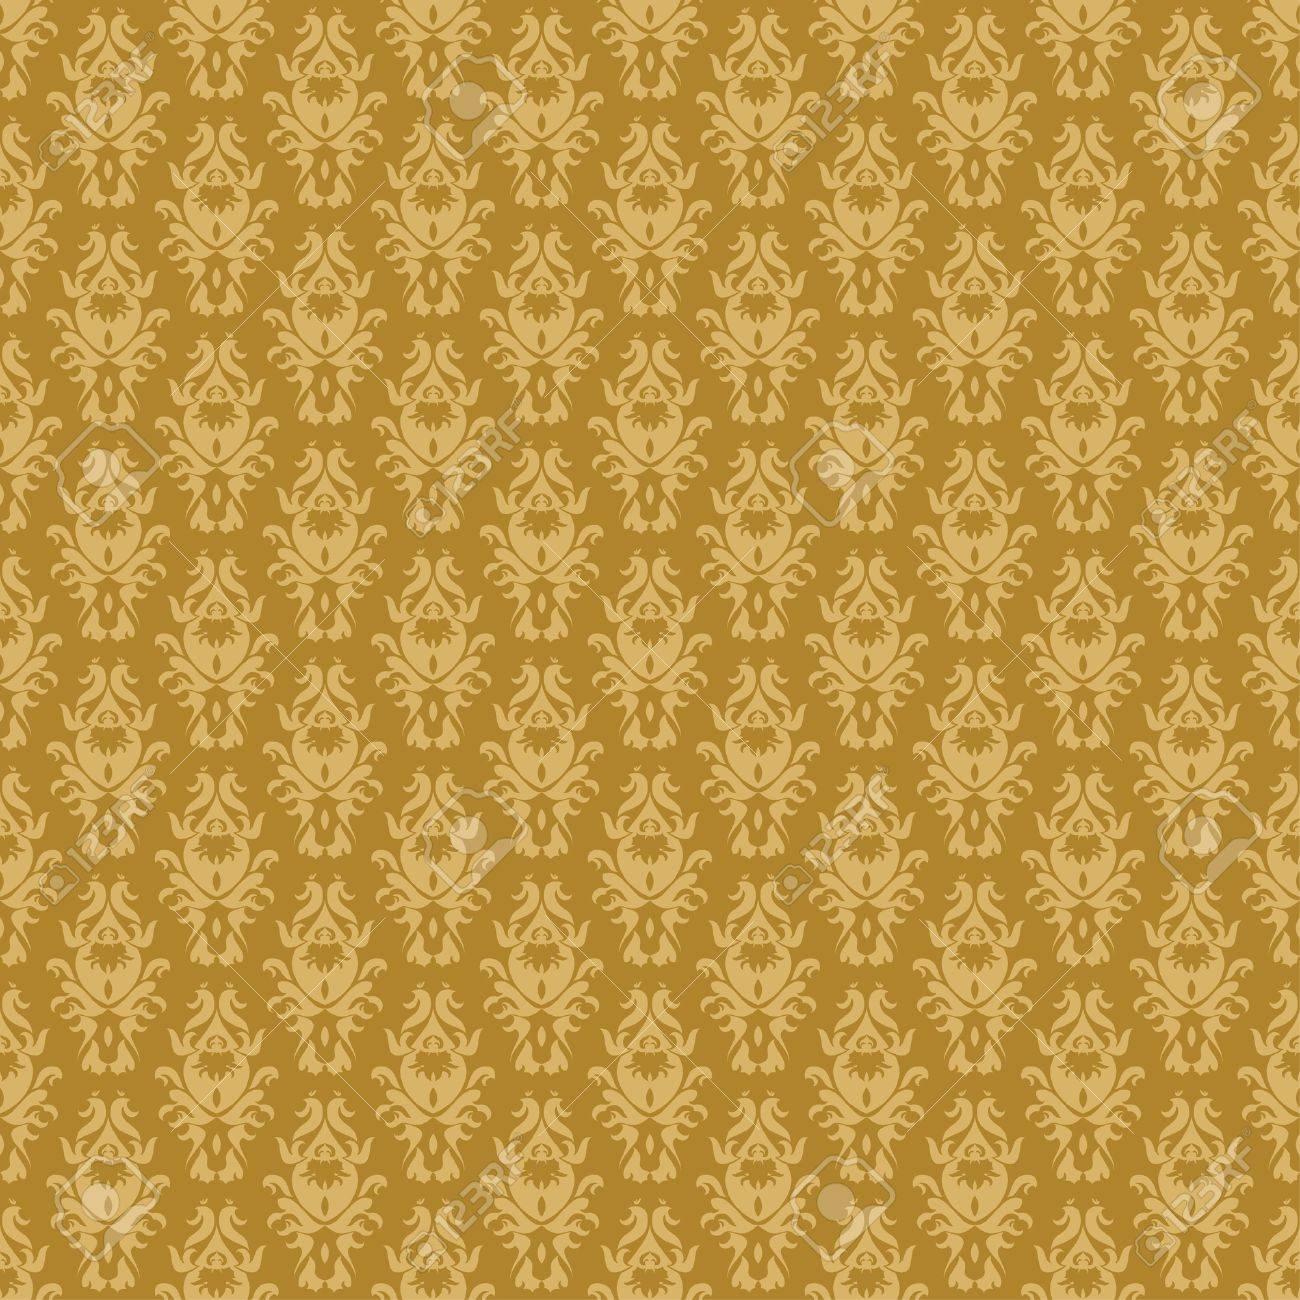 Vintage damask wallpaper Stock Vector - 8213557